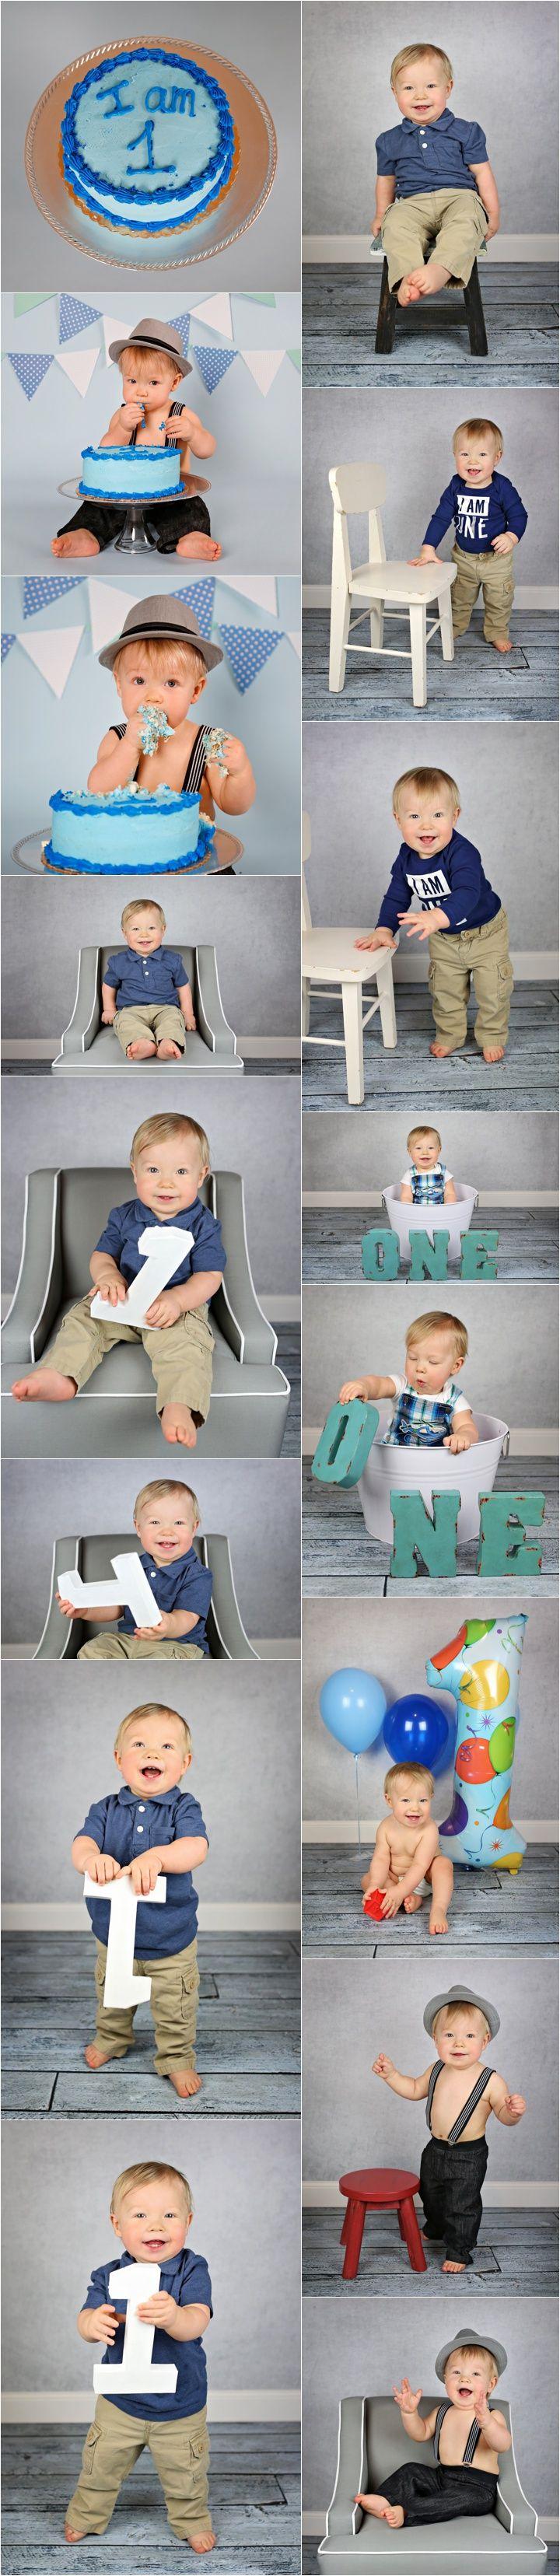 1 Year Old Boy Photo Shoot Ideas & Poses - Indoor Session - Cake Smash - Billings, MT Child & Portrait Photographer